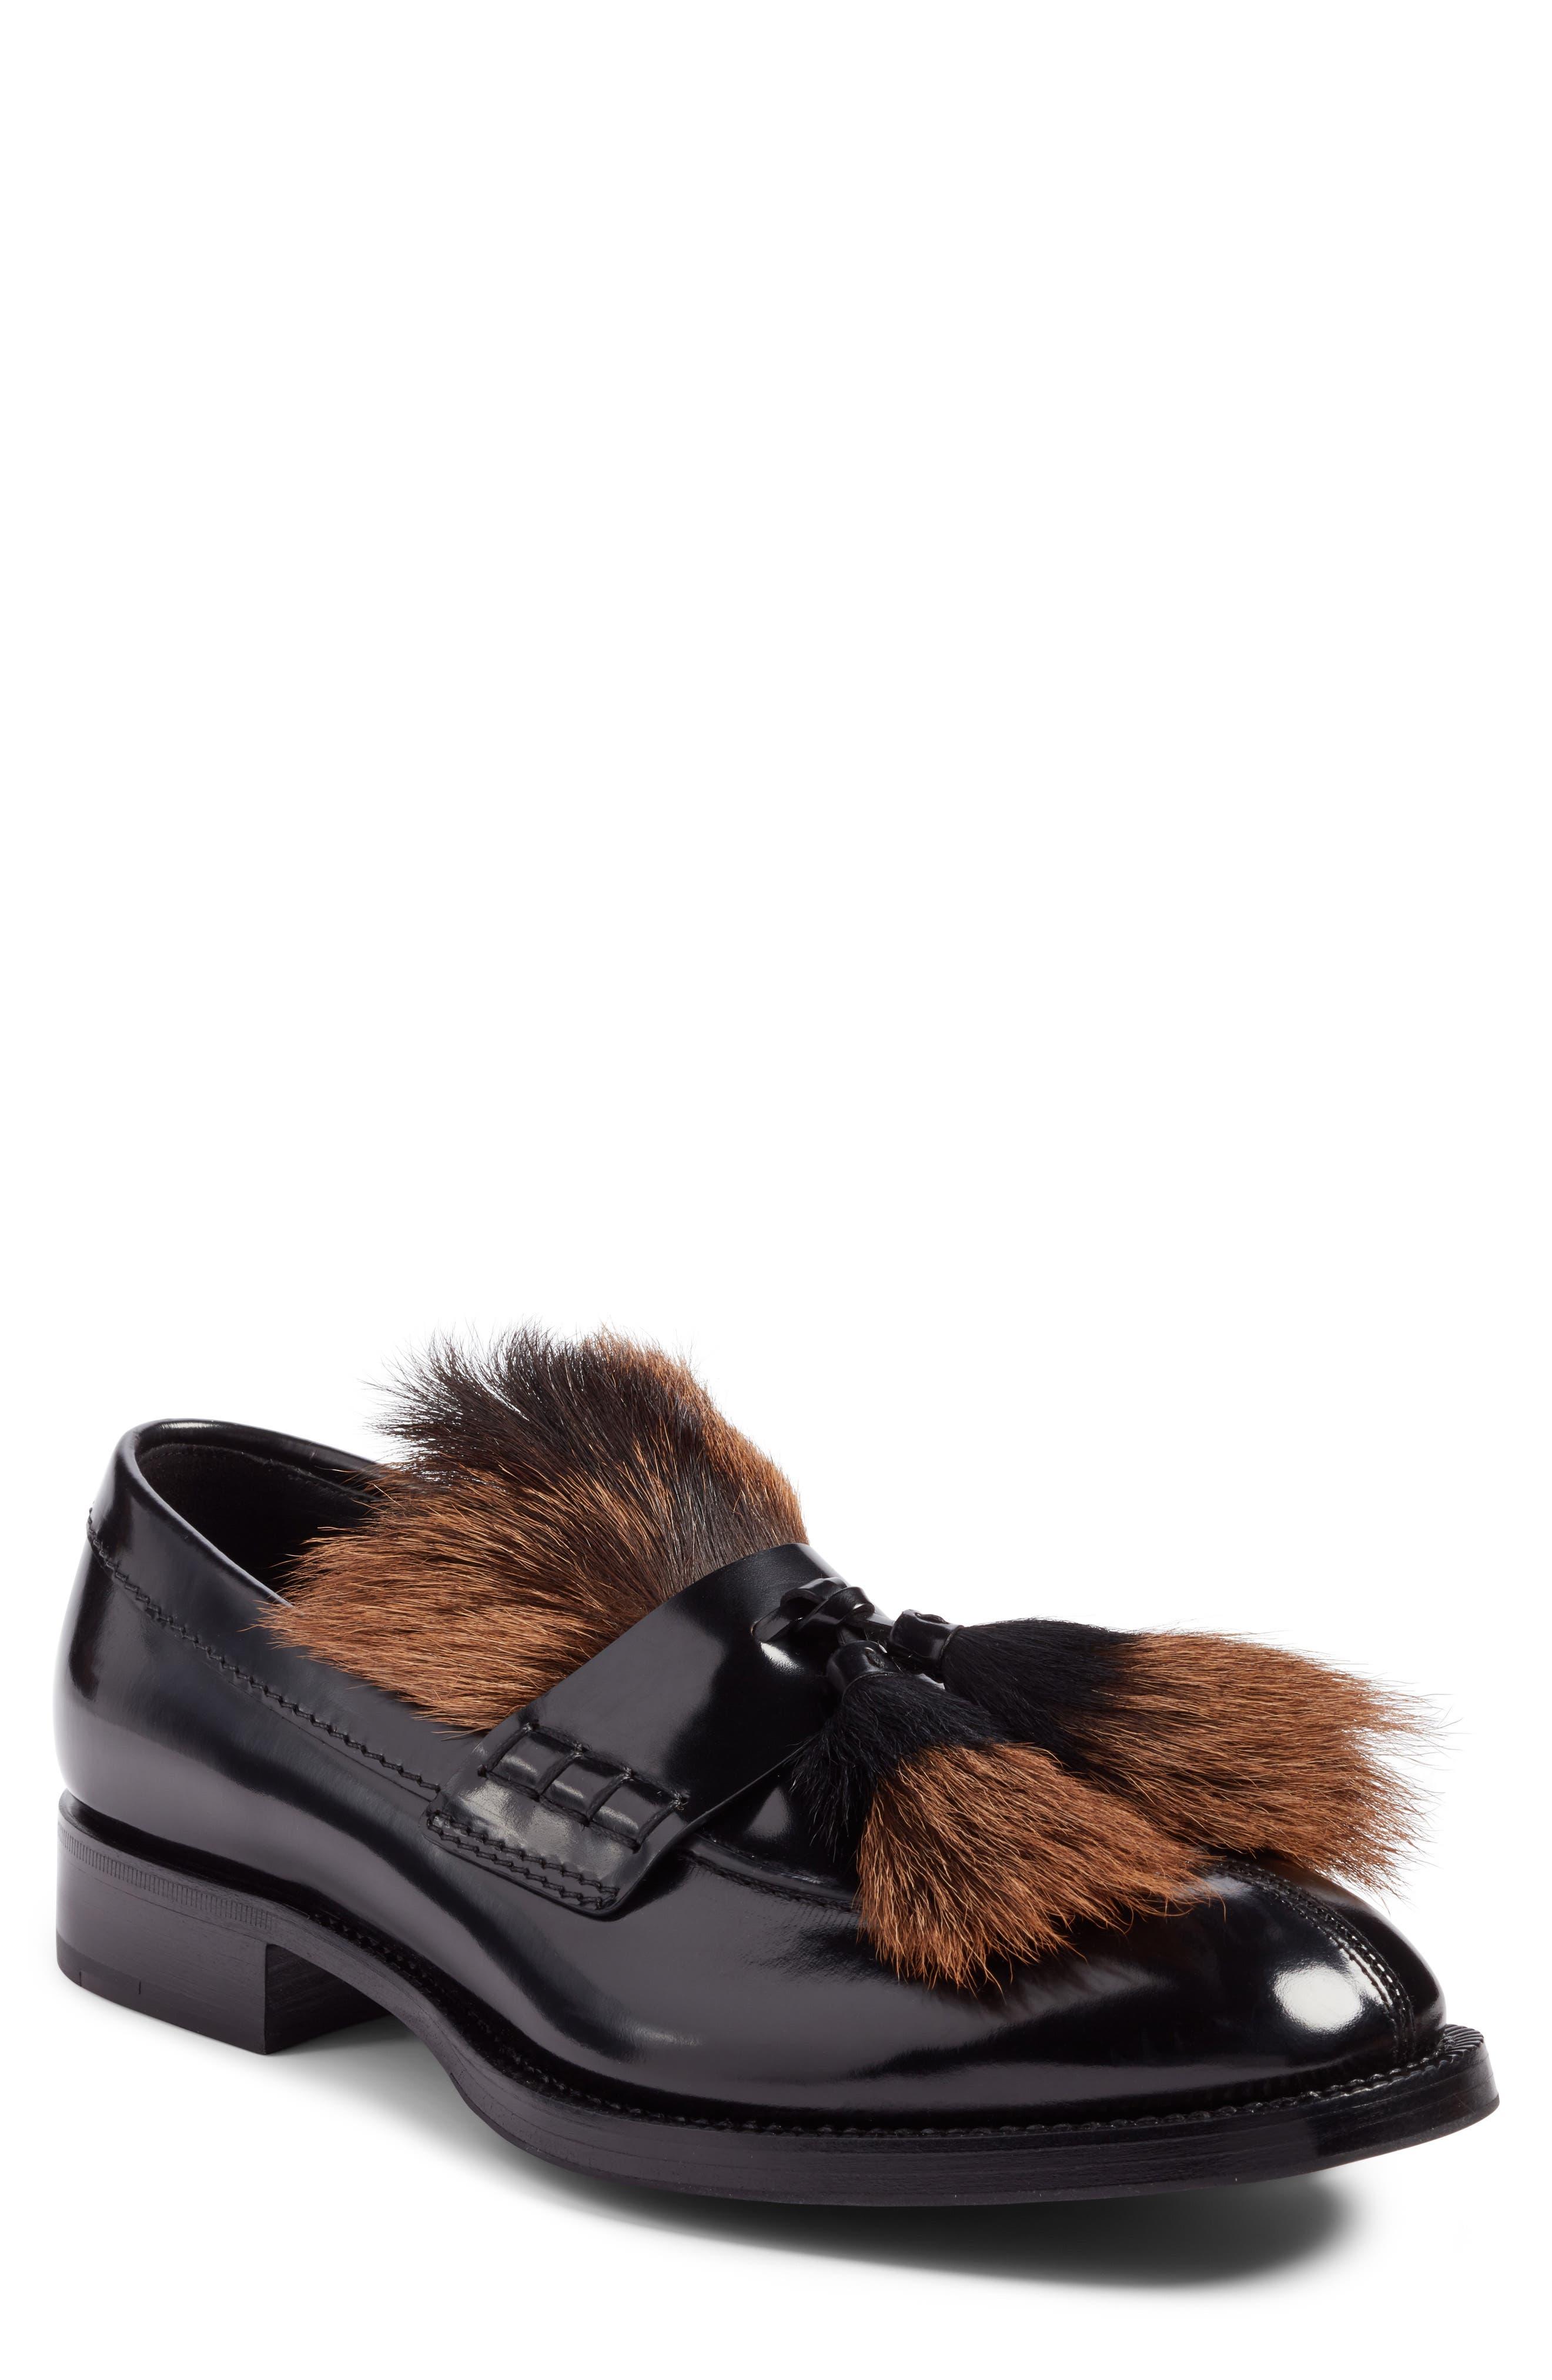 Alternate Image 1 Selected - Prada Tassel Loafer with Genuine Goat Hair Trim (Men)